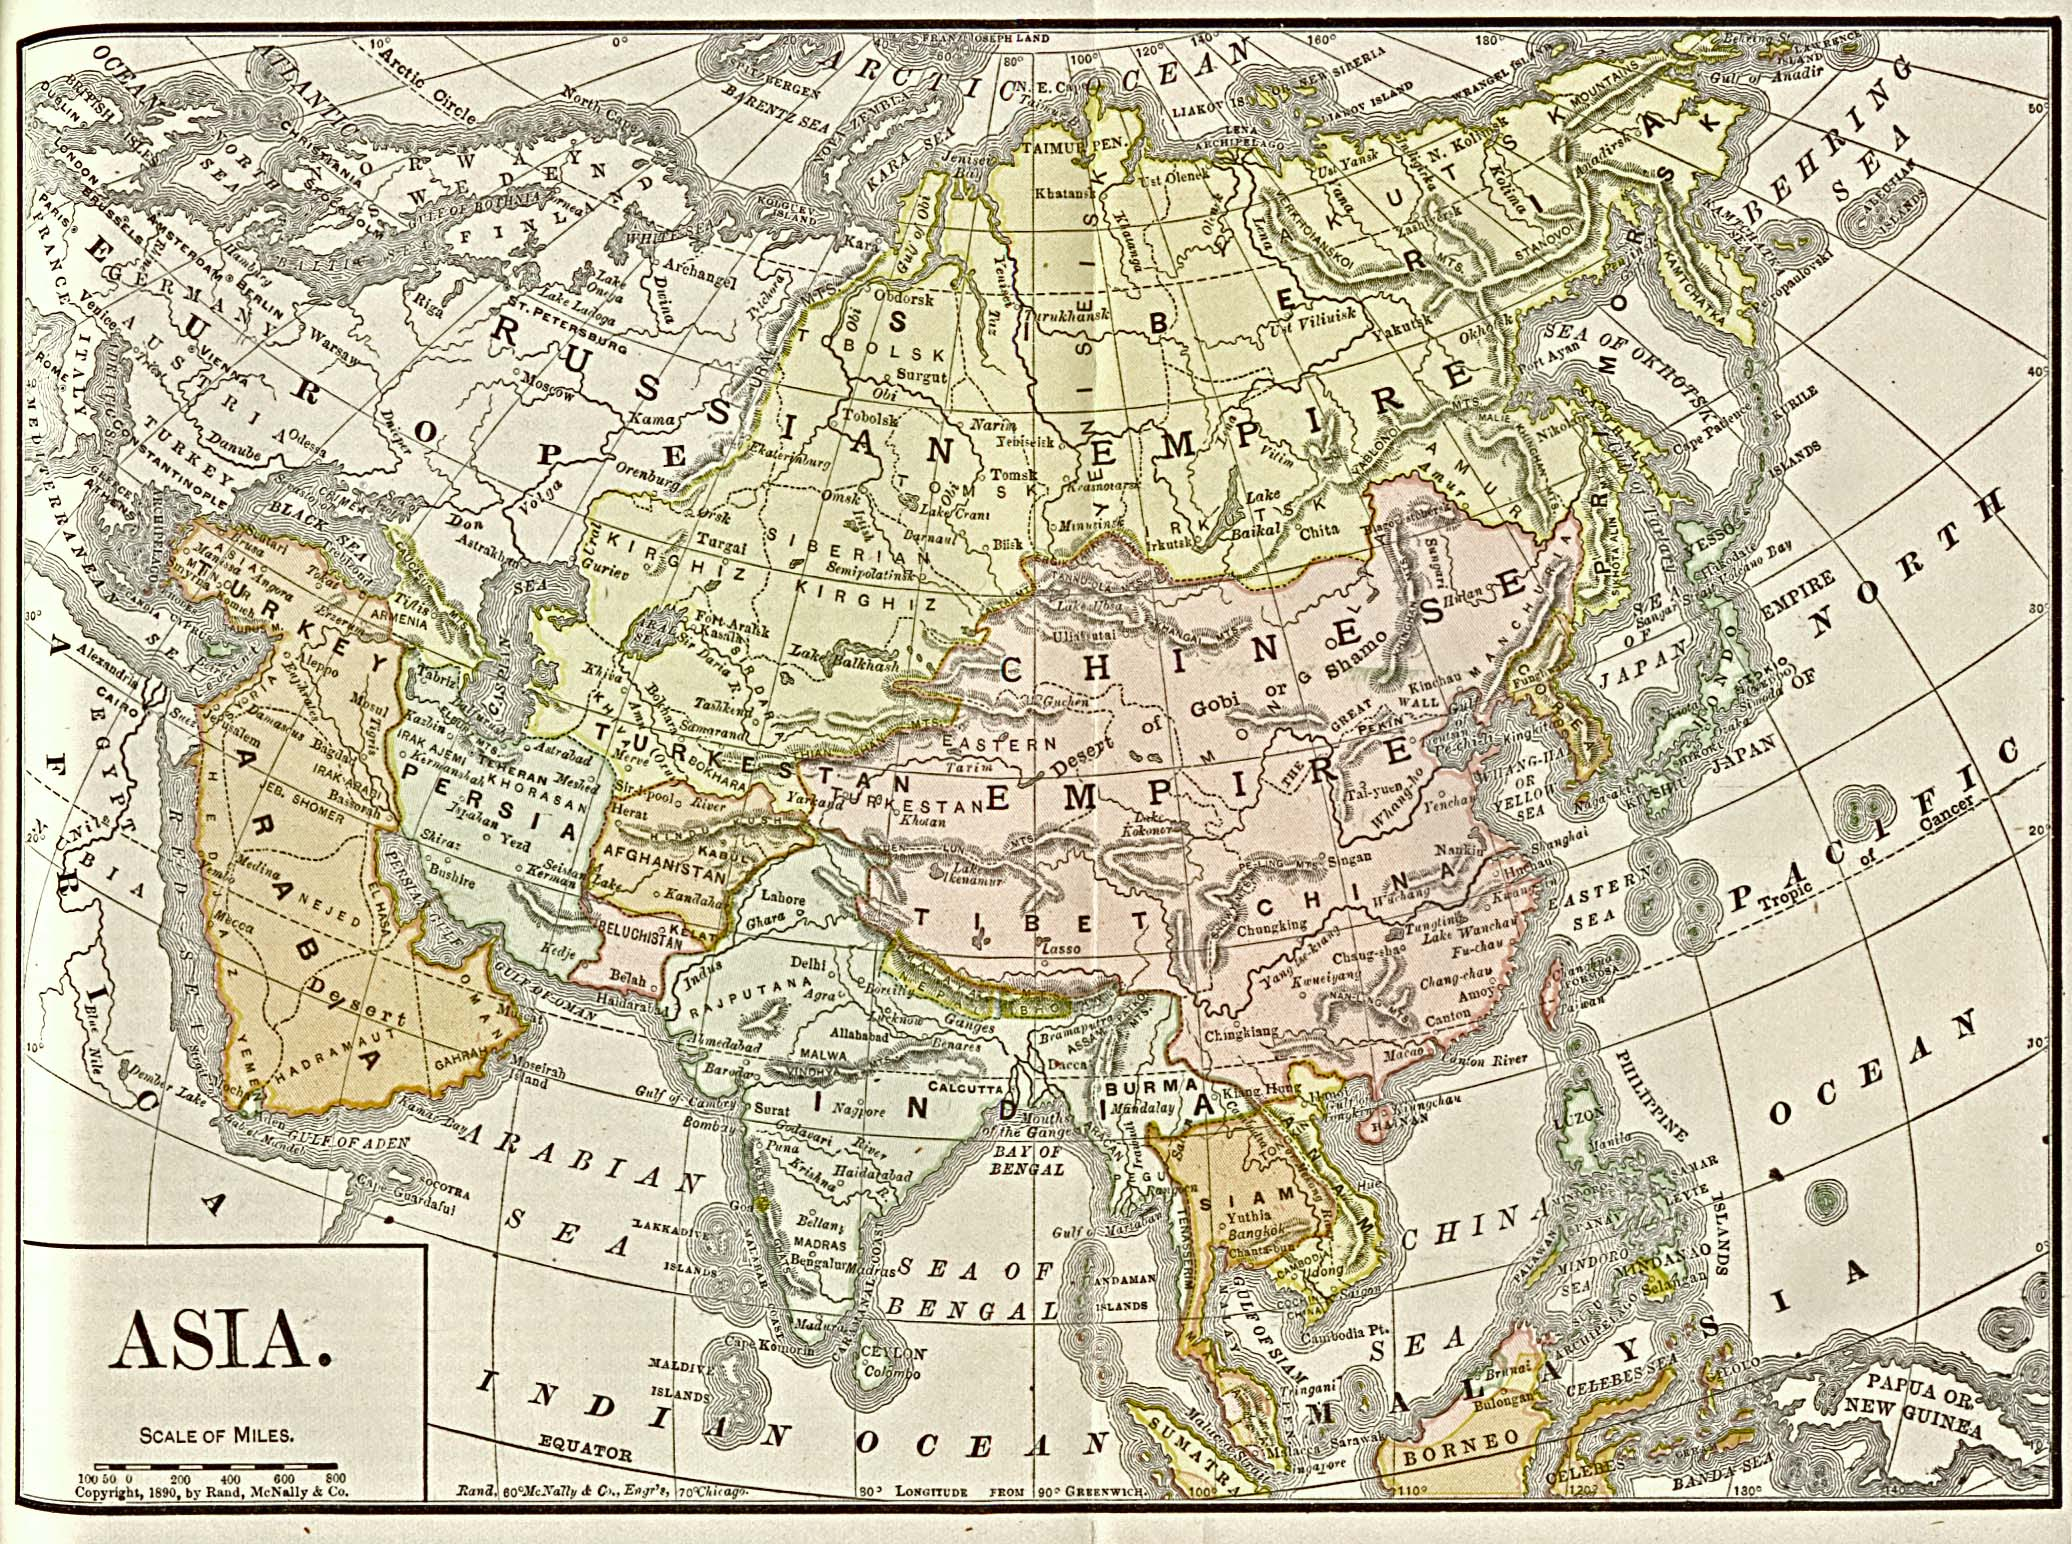 https://i0.wp.com/upload.wikimedia.org/wikipedia/commons/3/3b/Asia_1892_amer_ency_brit.jpg